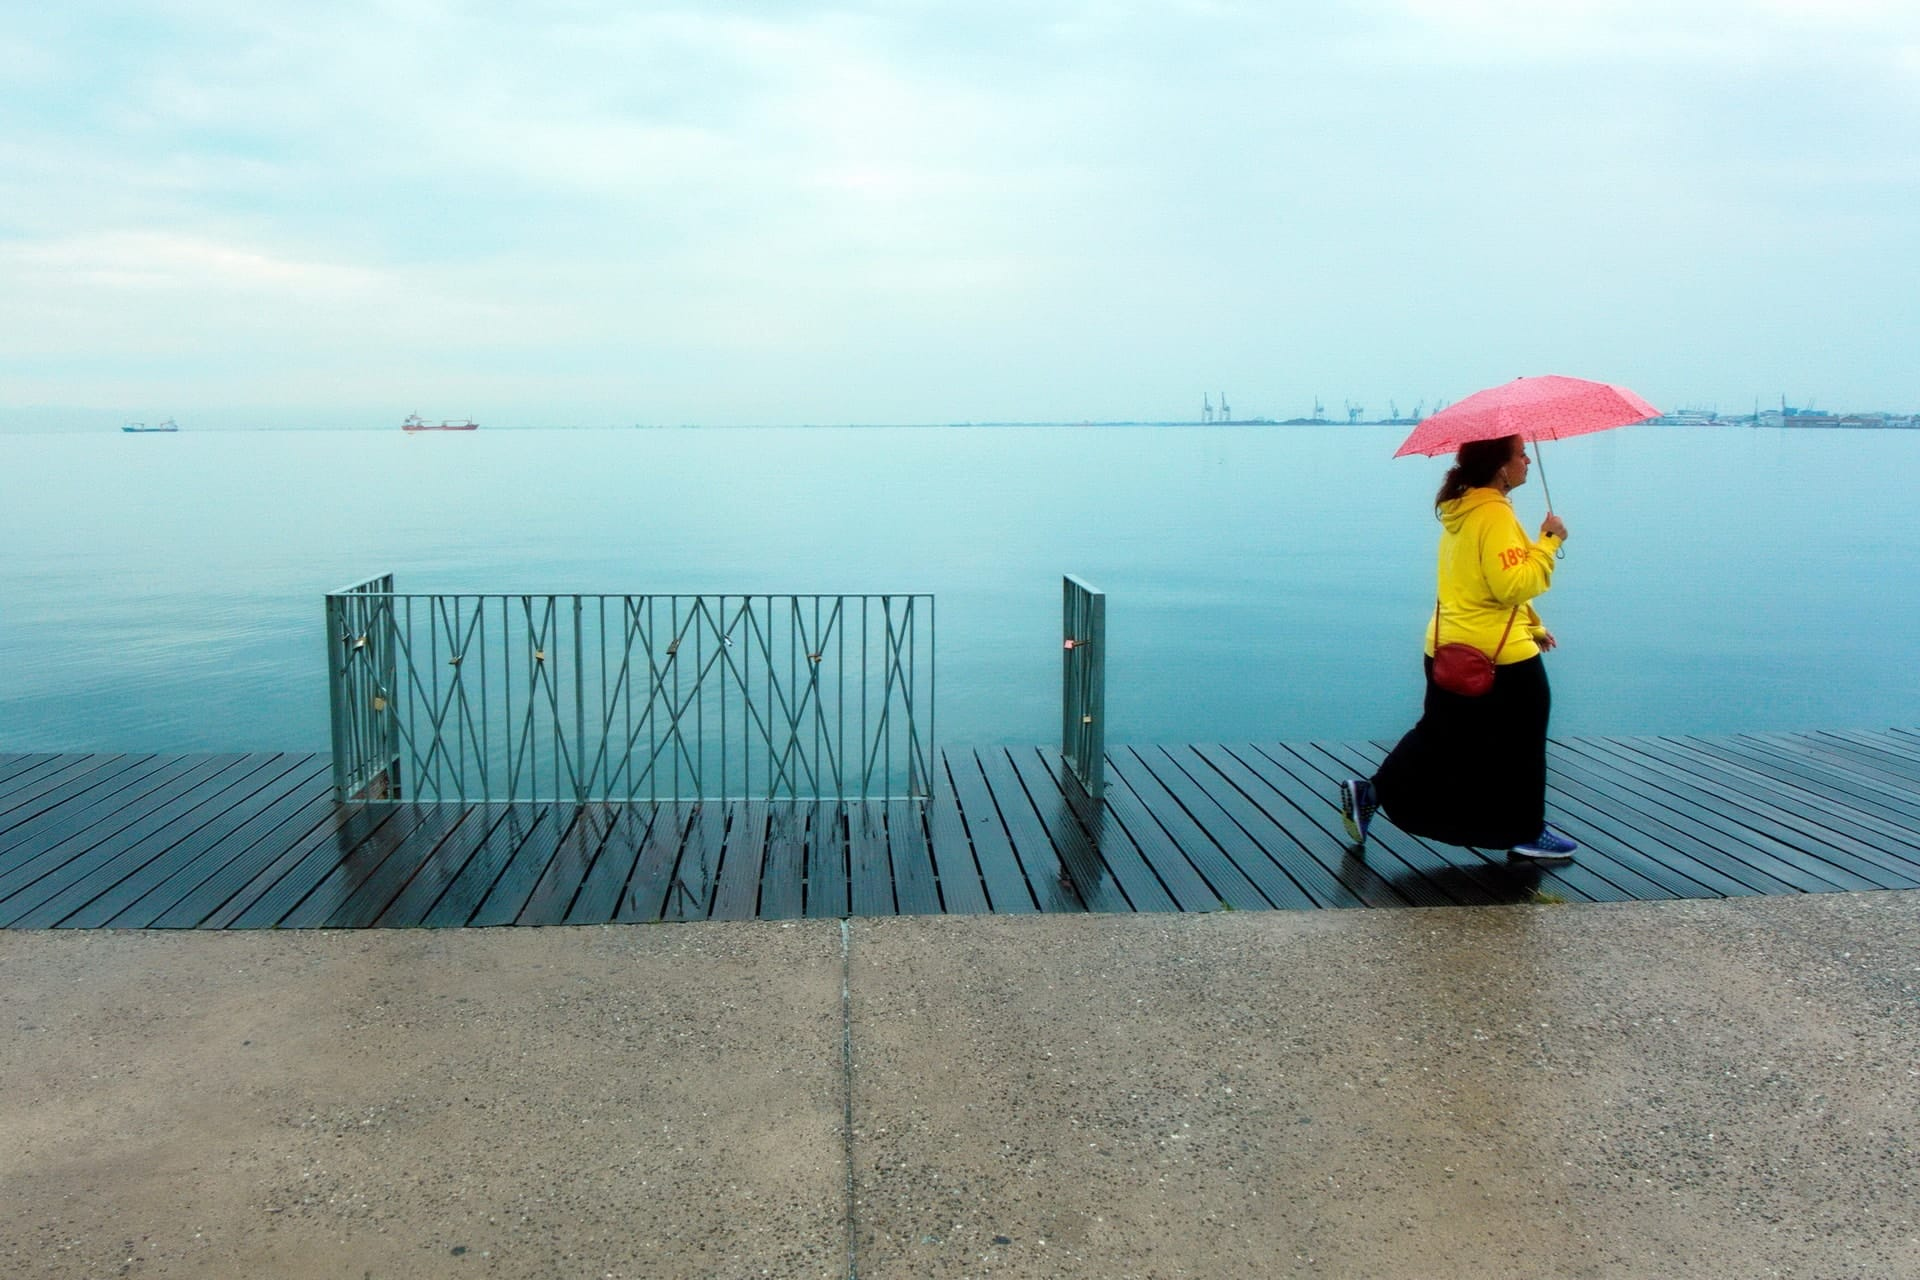 """Rainy day"" Street Photograph by Makis Makris"